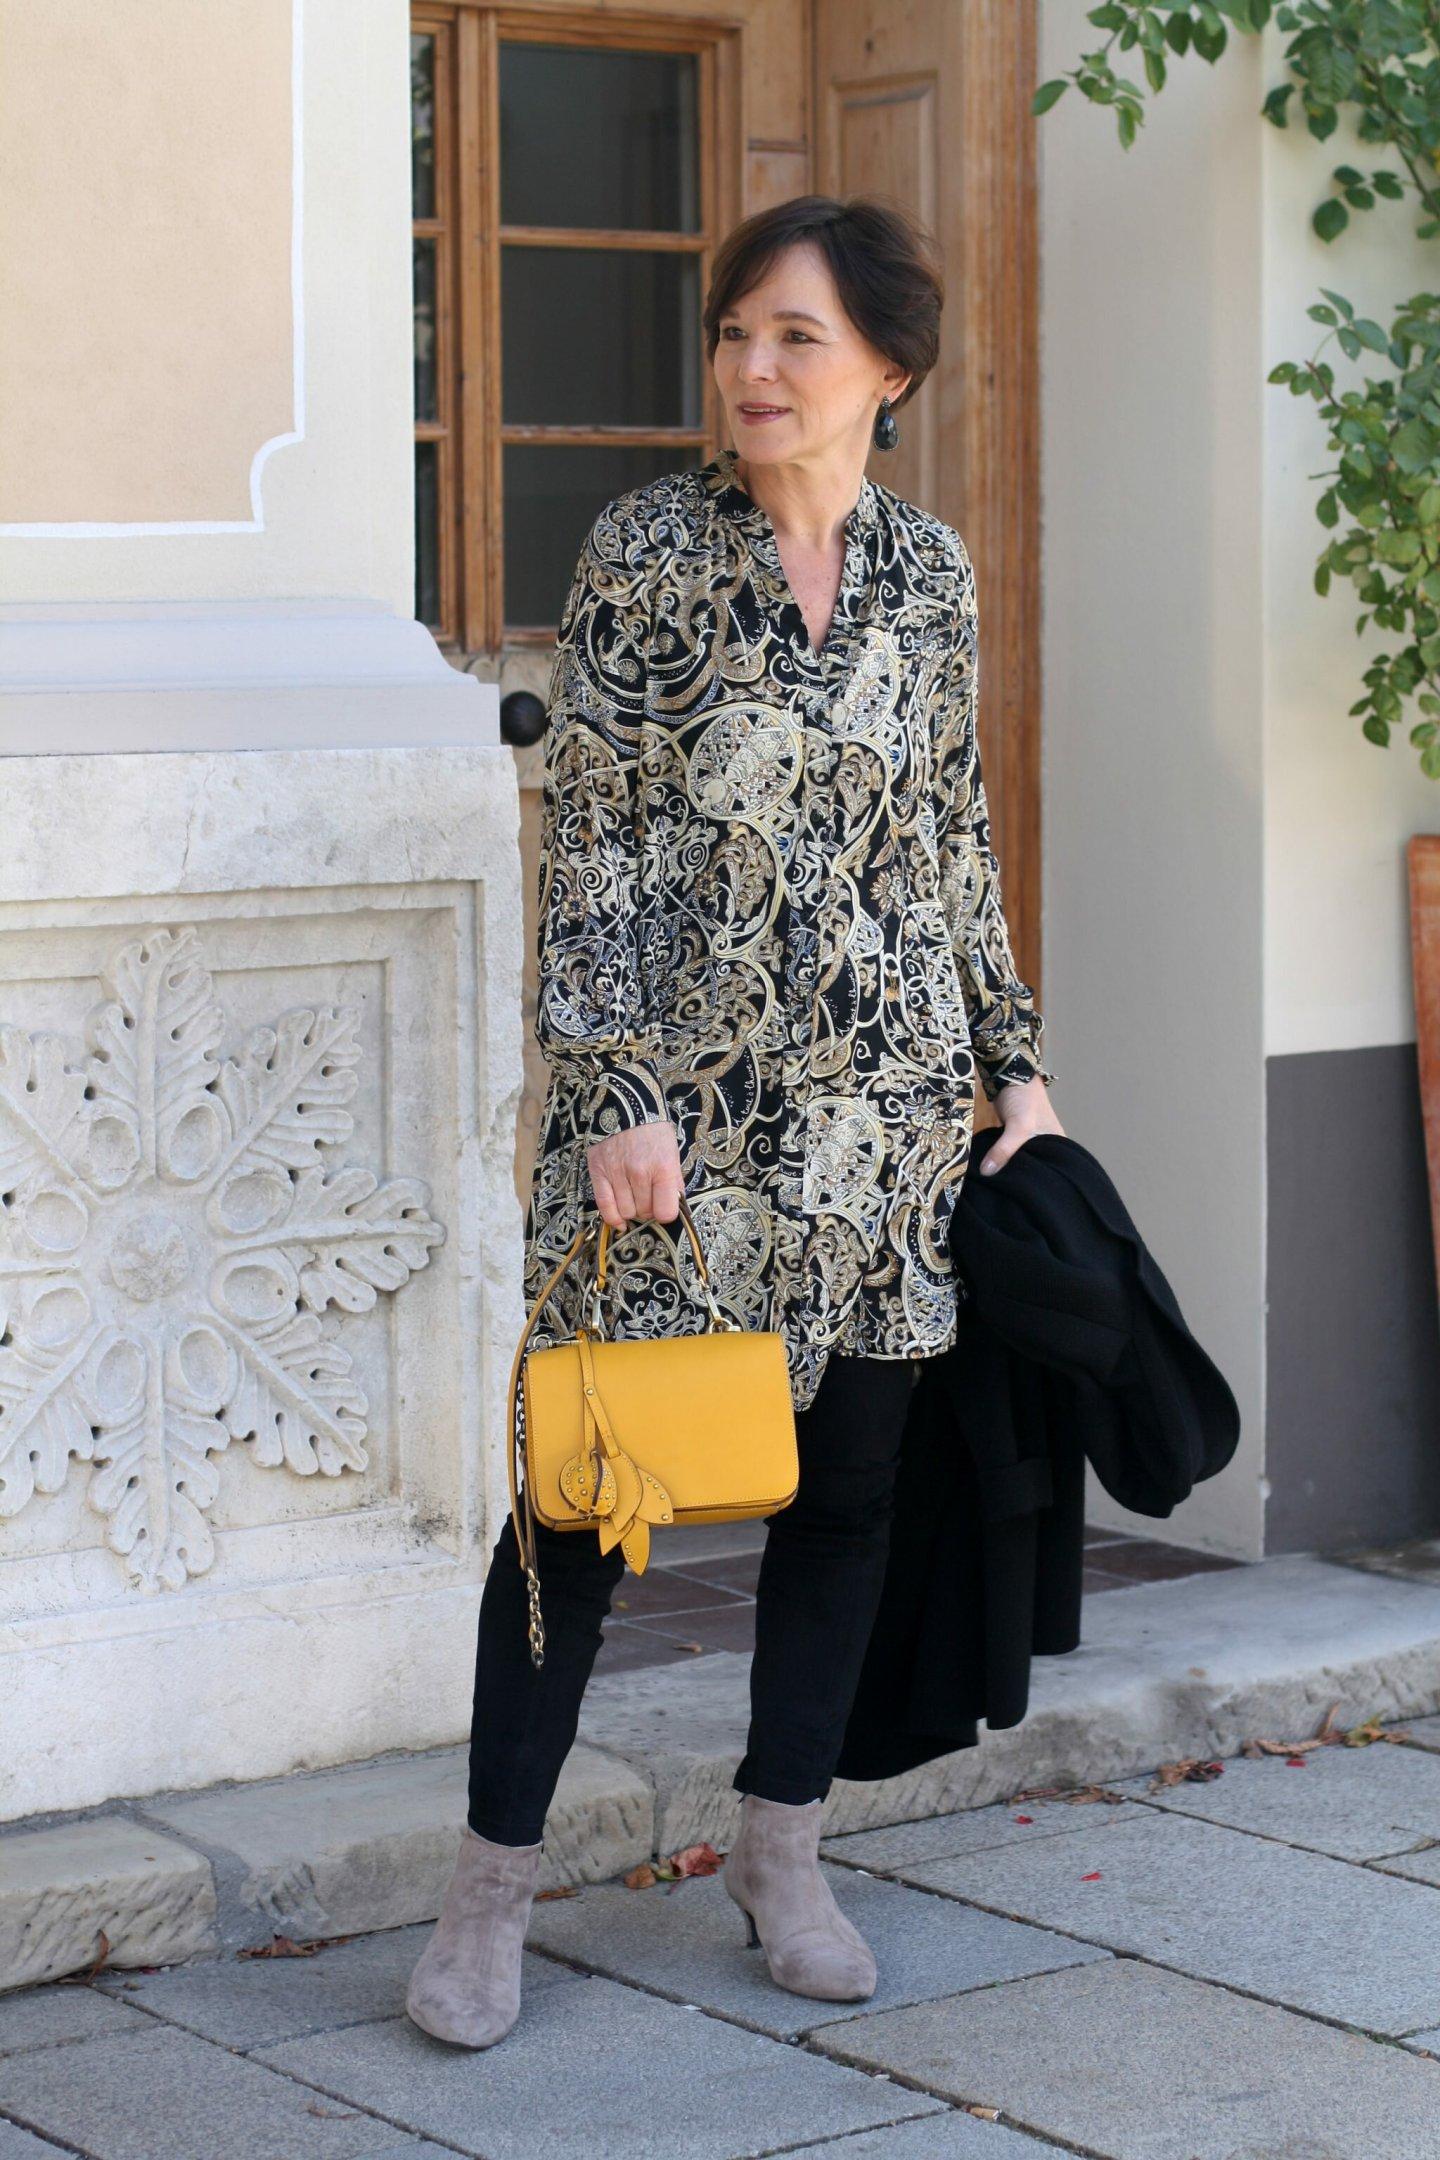 Tunika Paisley Herbstfarben Gelb Lederleggings 50plus LadyofStyle